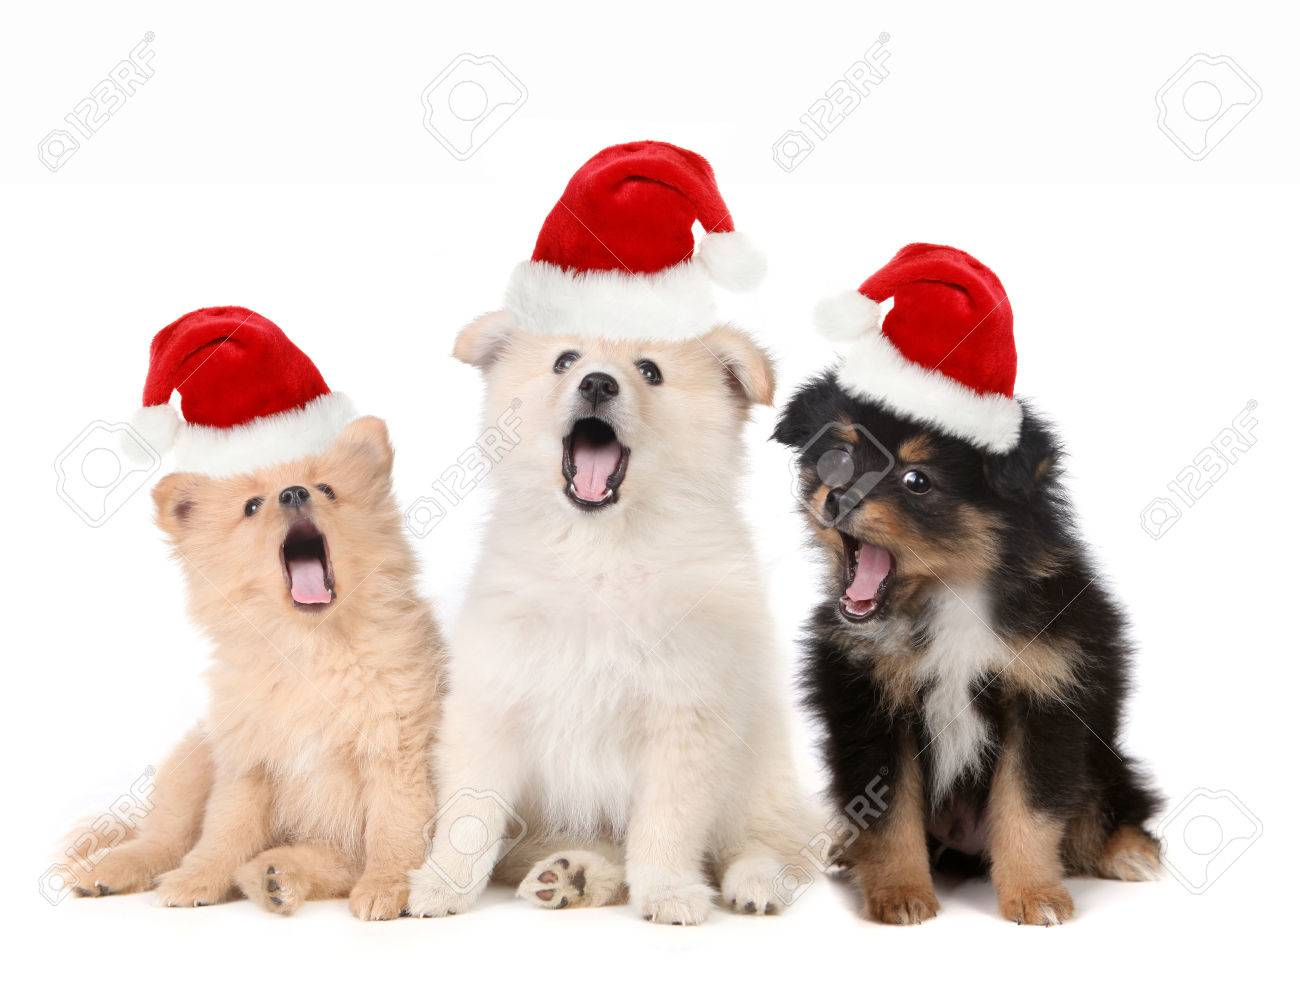 Christmas Puppies.Singing Christmas Puppies Wearing Santa Hats On White